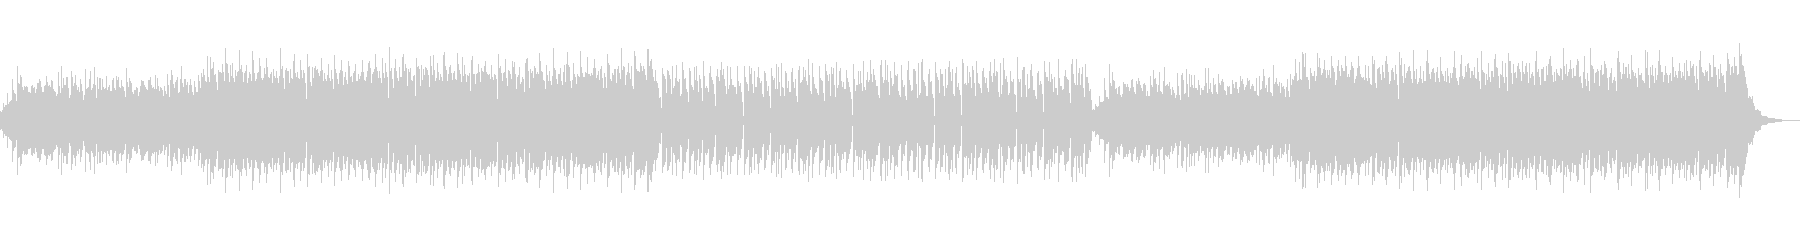 EDM・ポップ・キャッチー・メロディーの未再生の波形